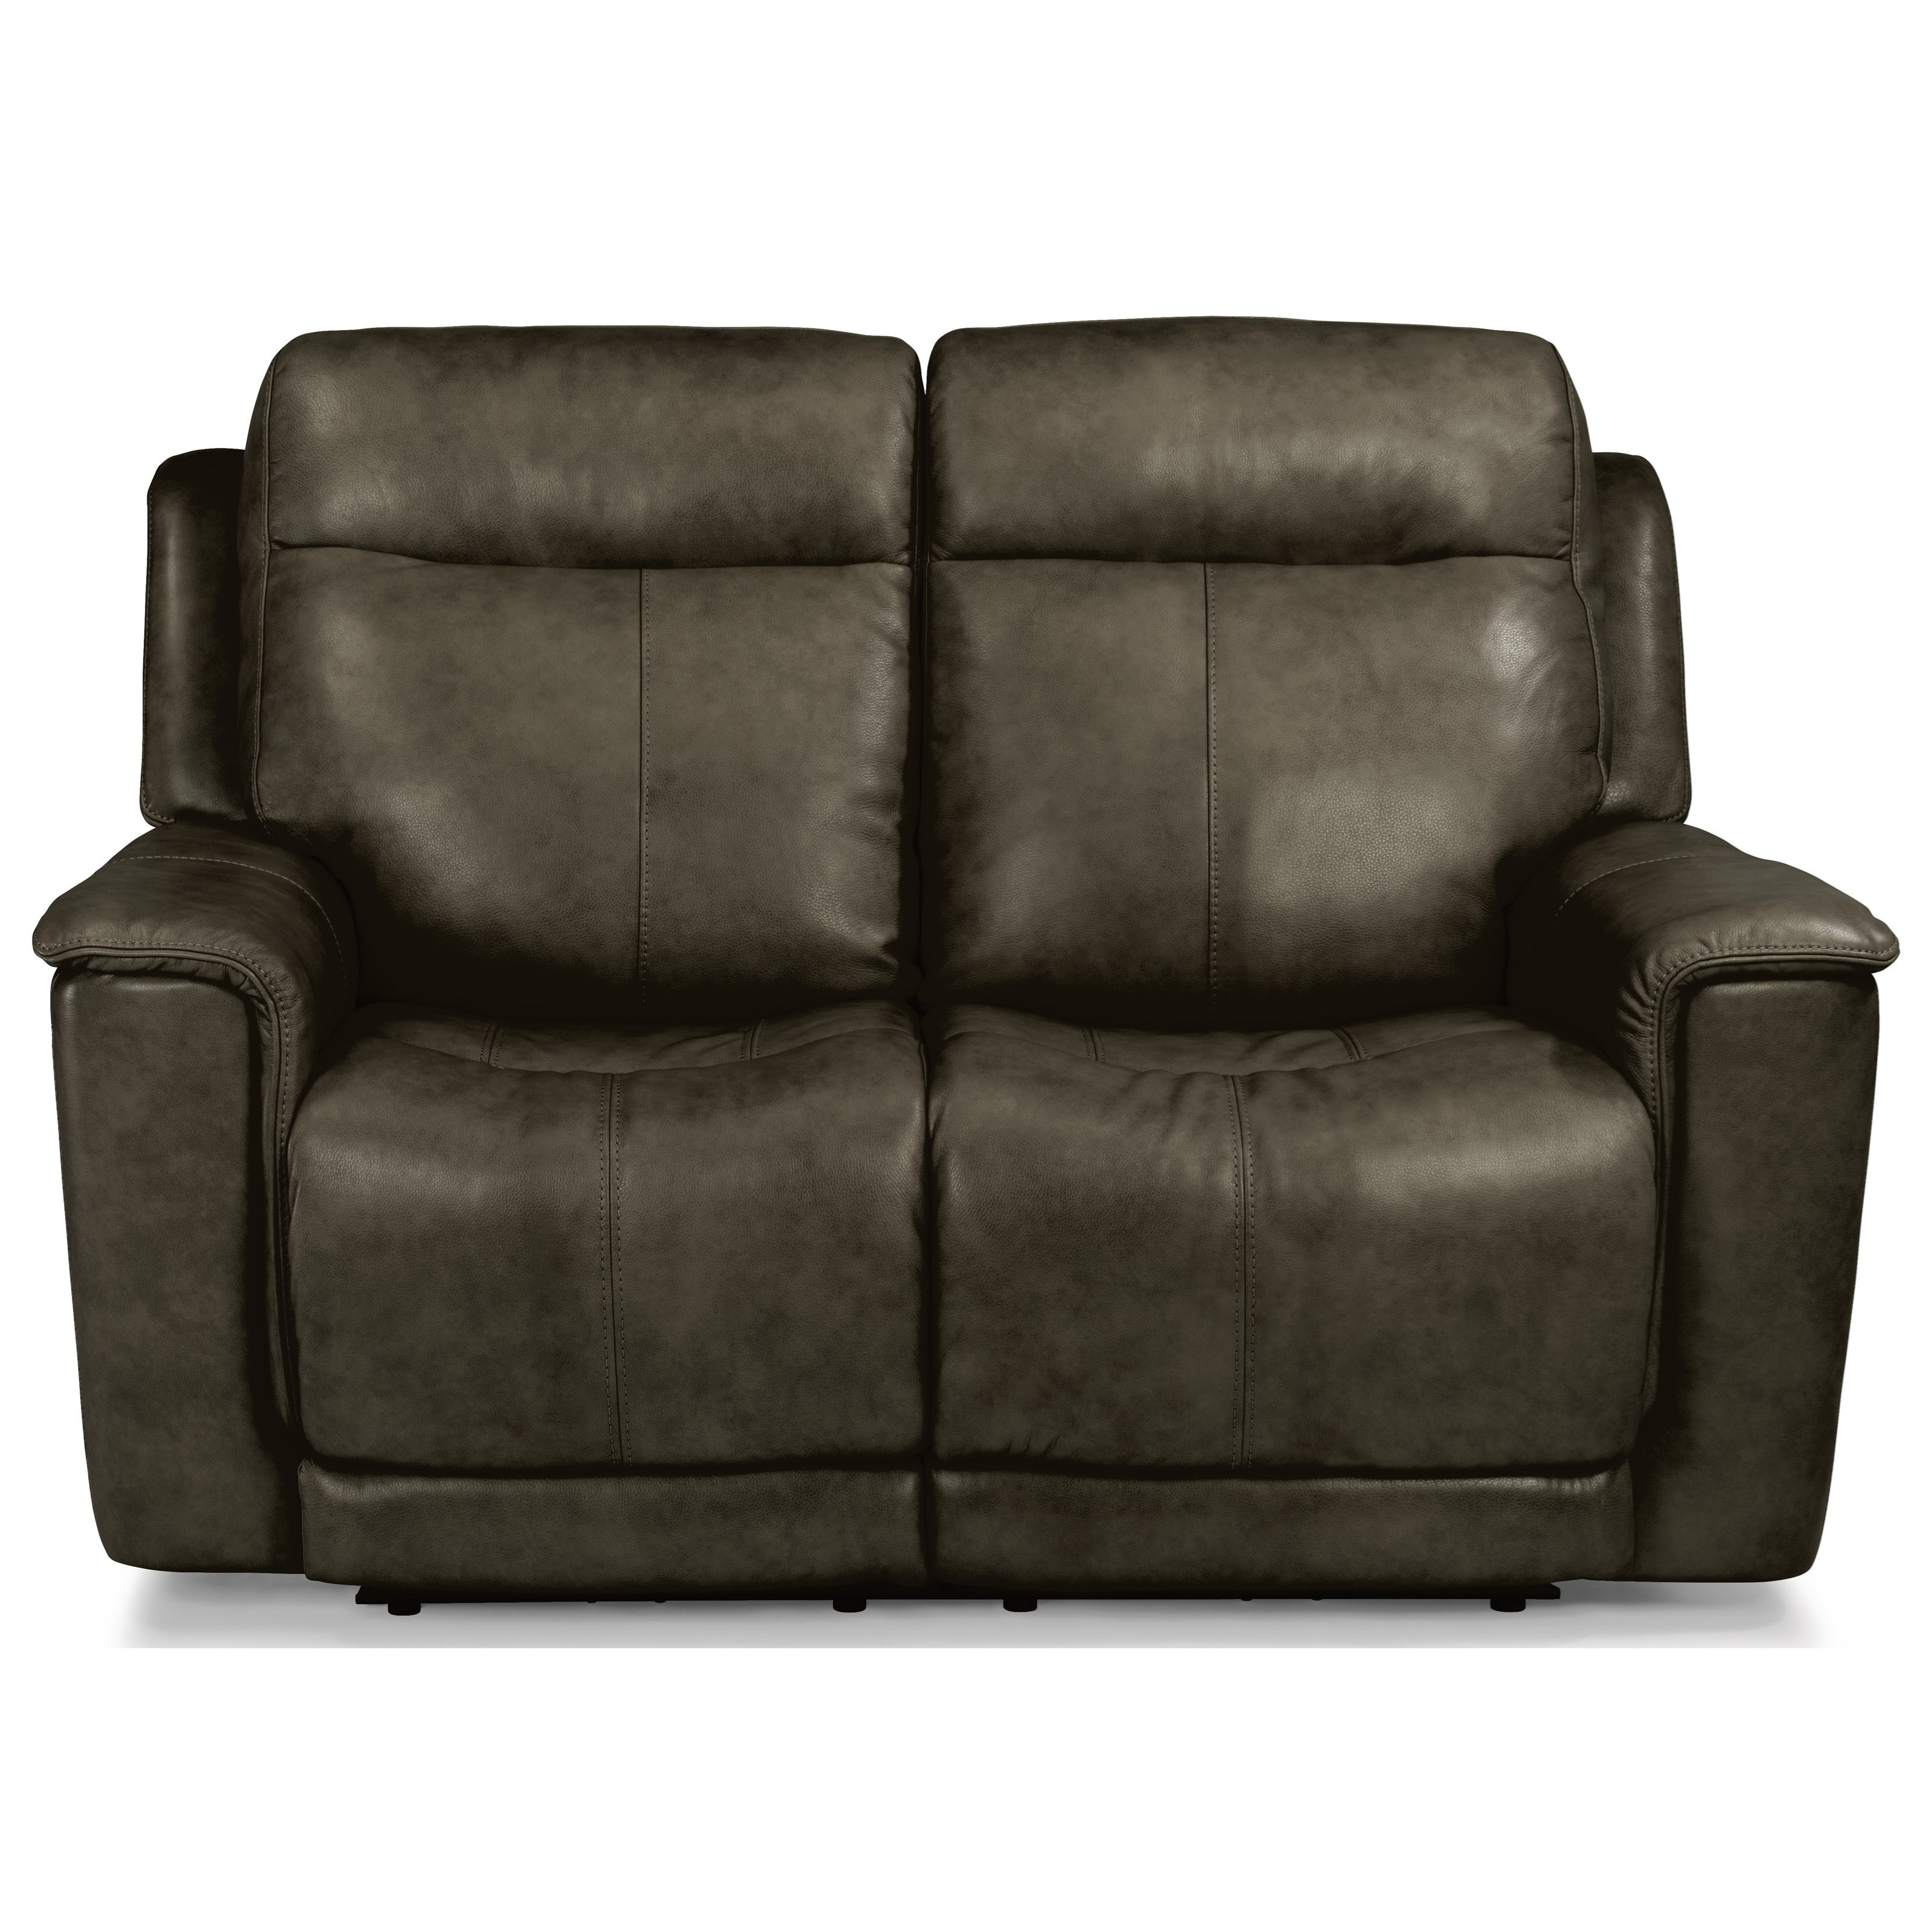 Latitudes - Miller Power Reclining Love Seat by Flexsteel at Walker's Furniture